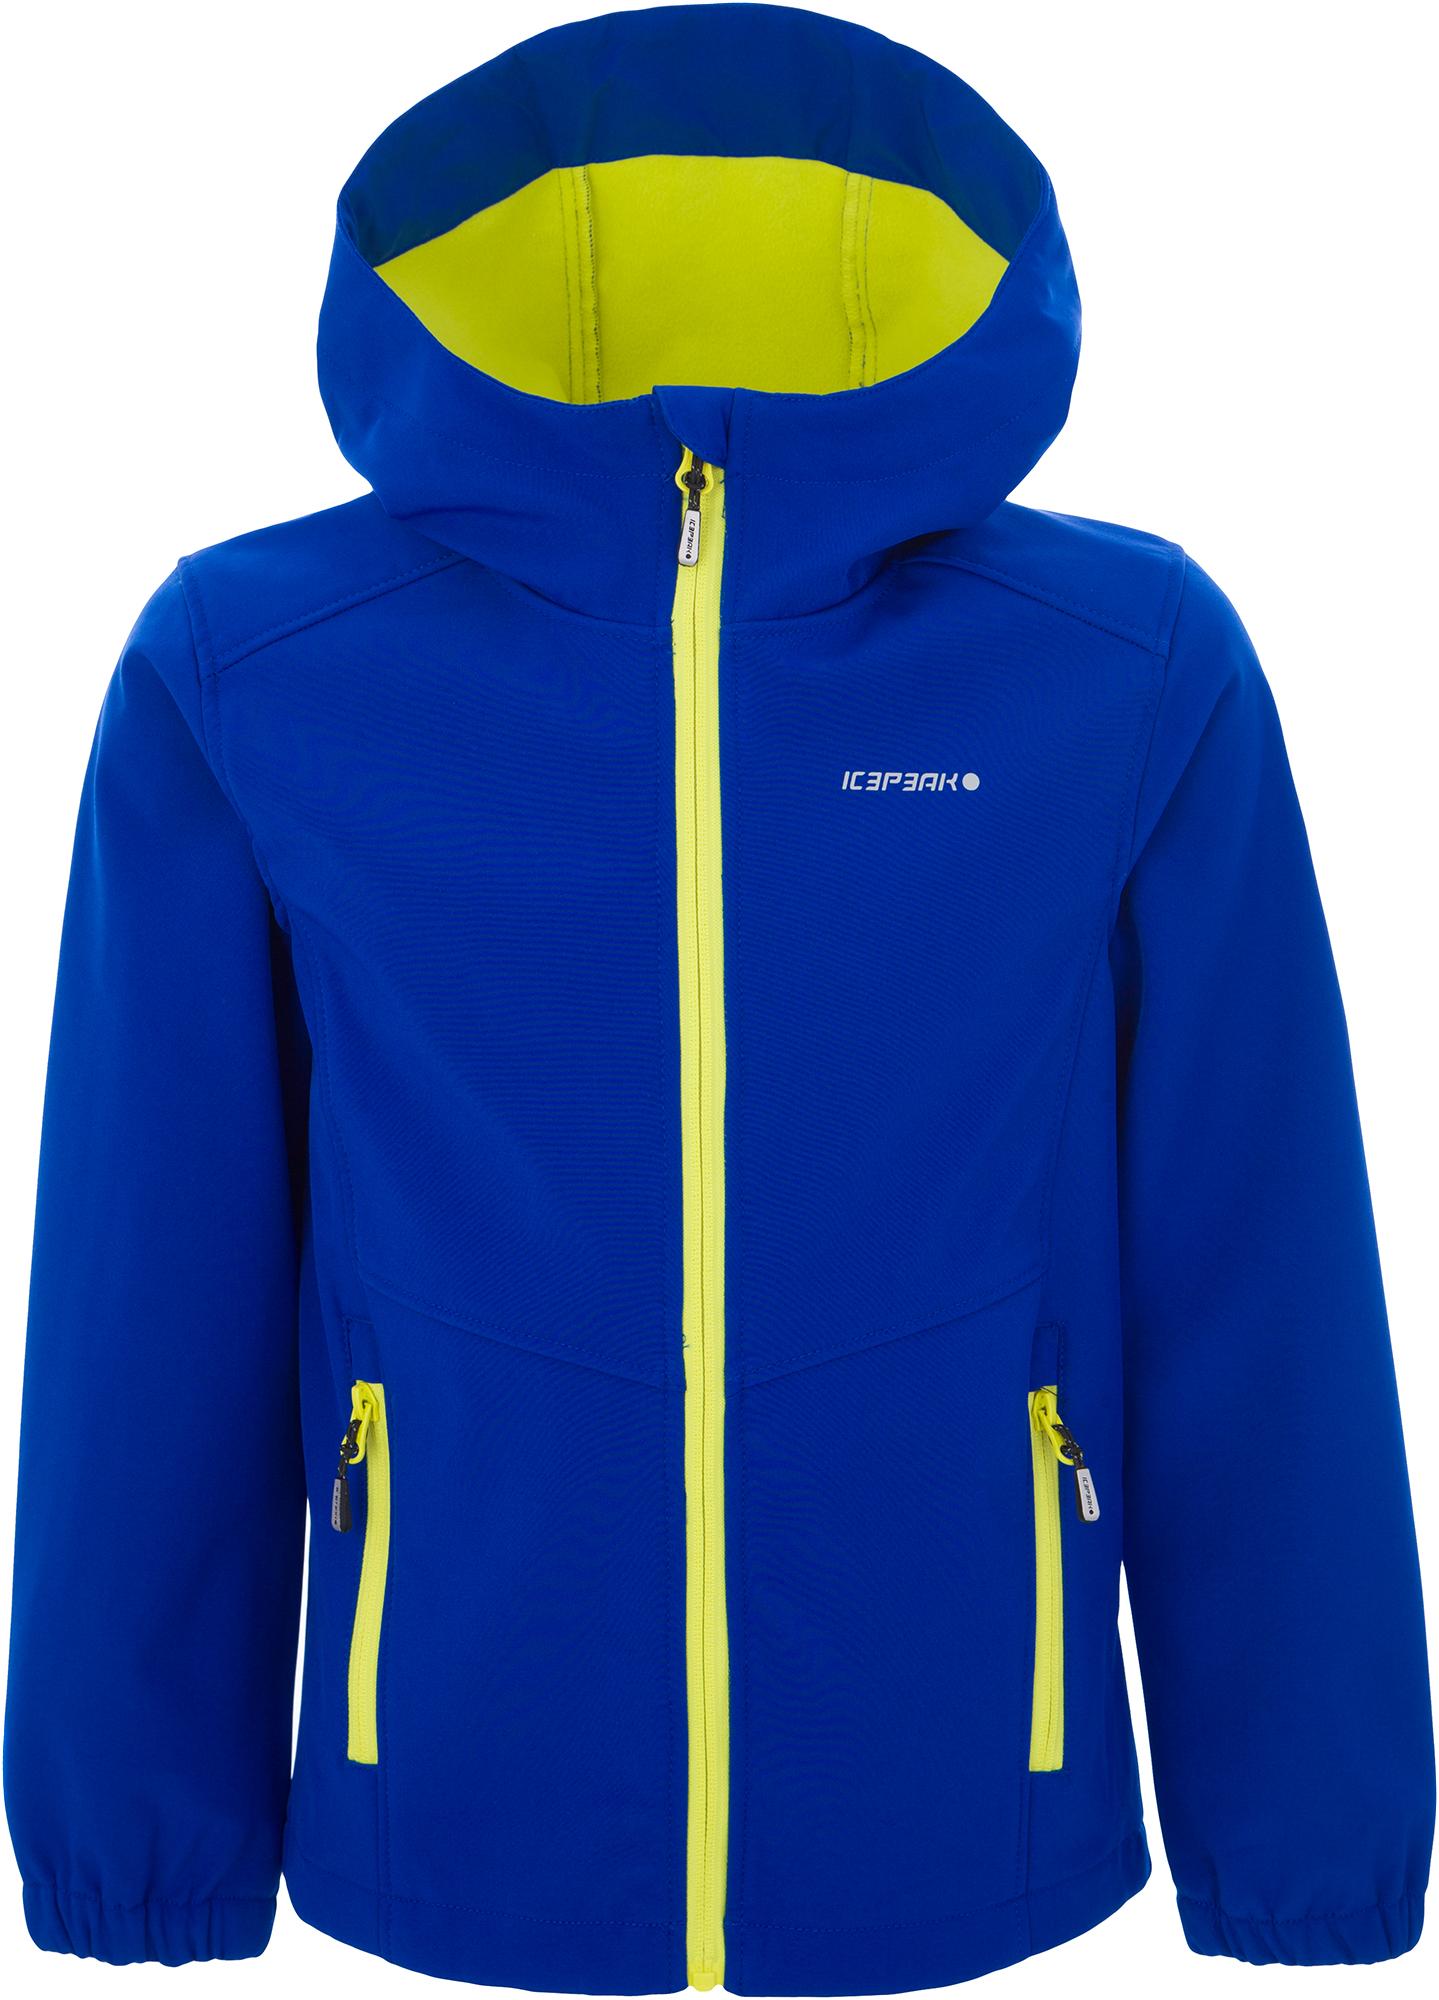 IcePeak Куртка софт-шелл для мальчиков IcePeak Teiko, размер 176